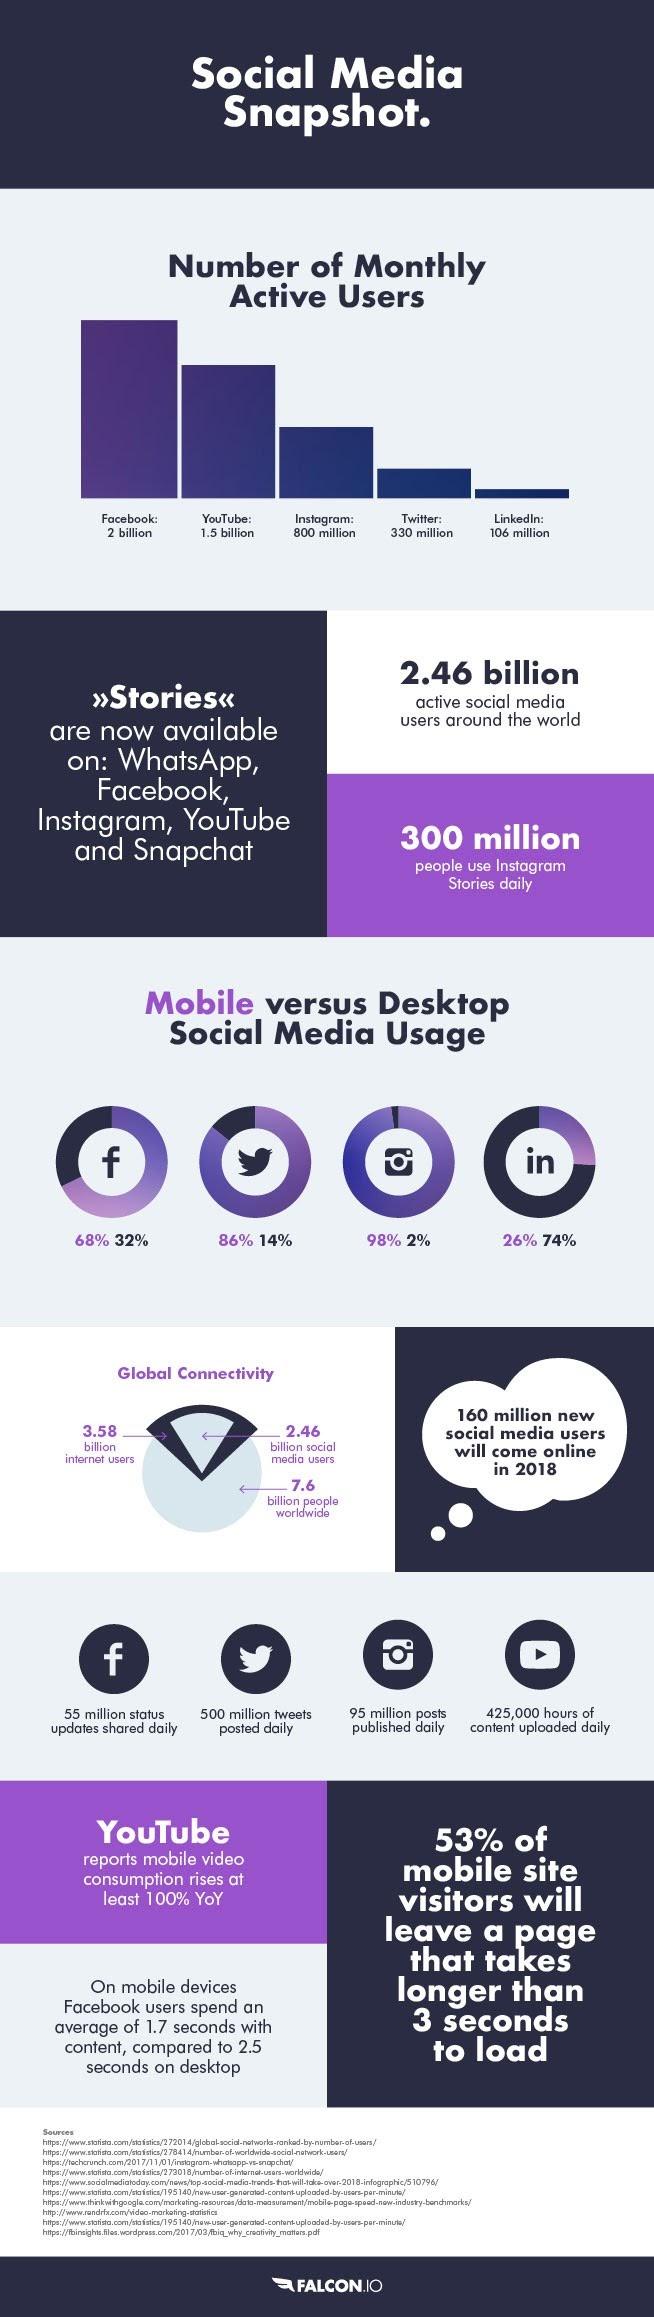 2018 Social Media Snapshot - #infographic